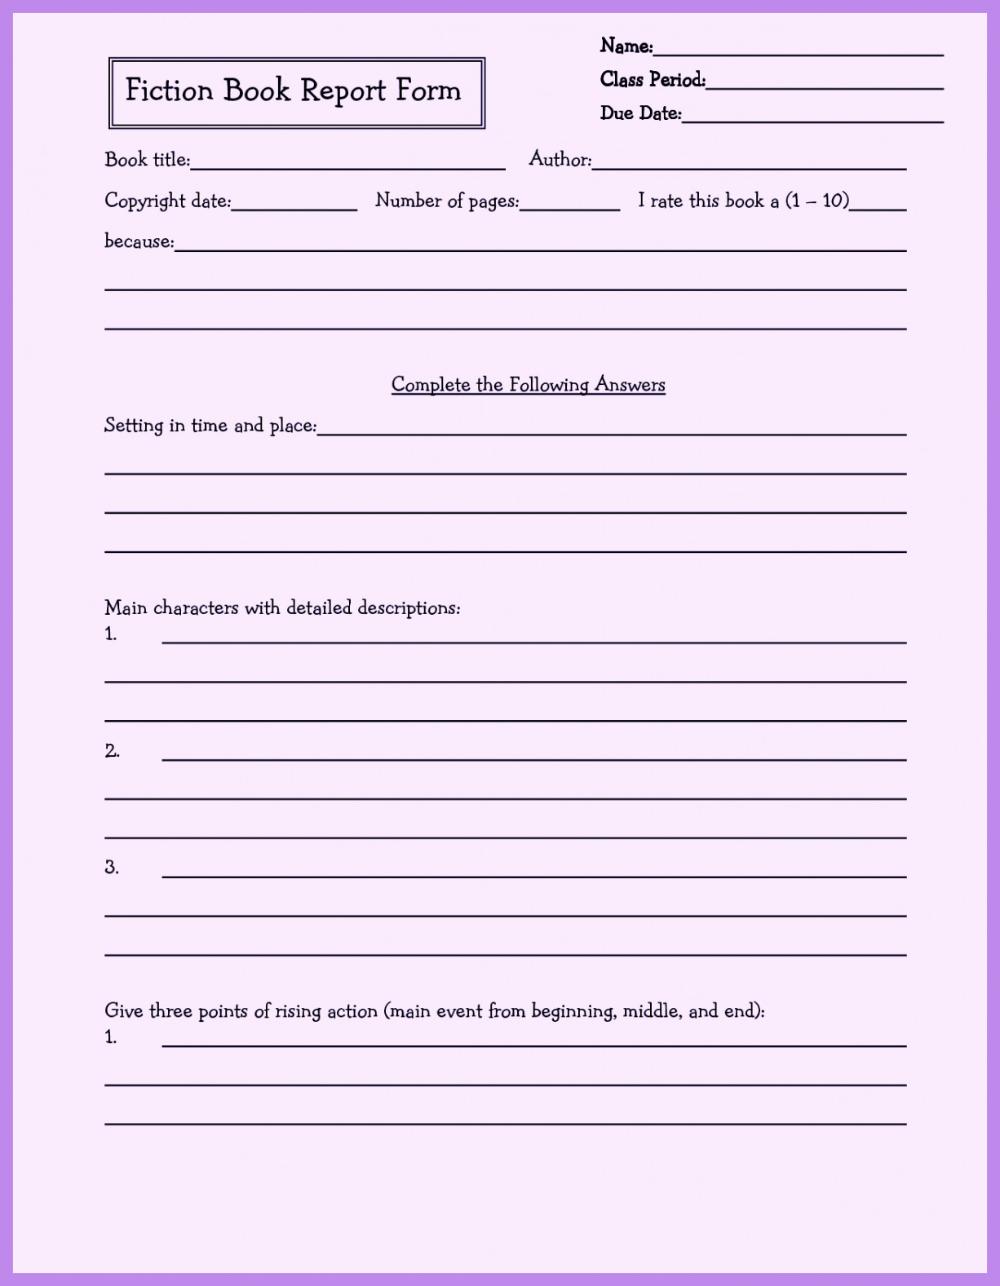 Grade 9 Book Report Template 3 Templates Example Templates Example [ 1286 x 1000 Pixel ]